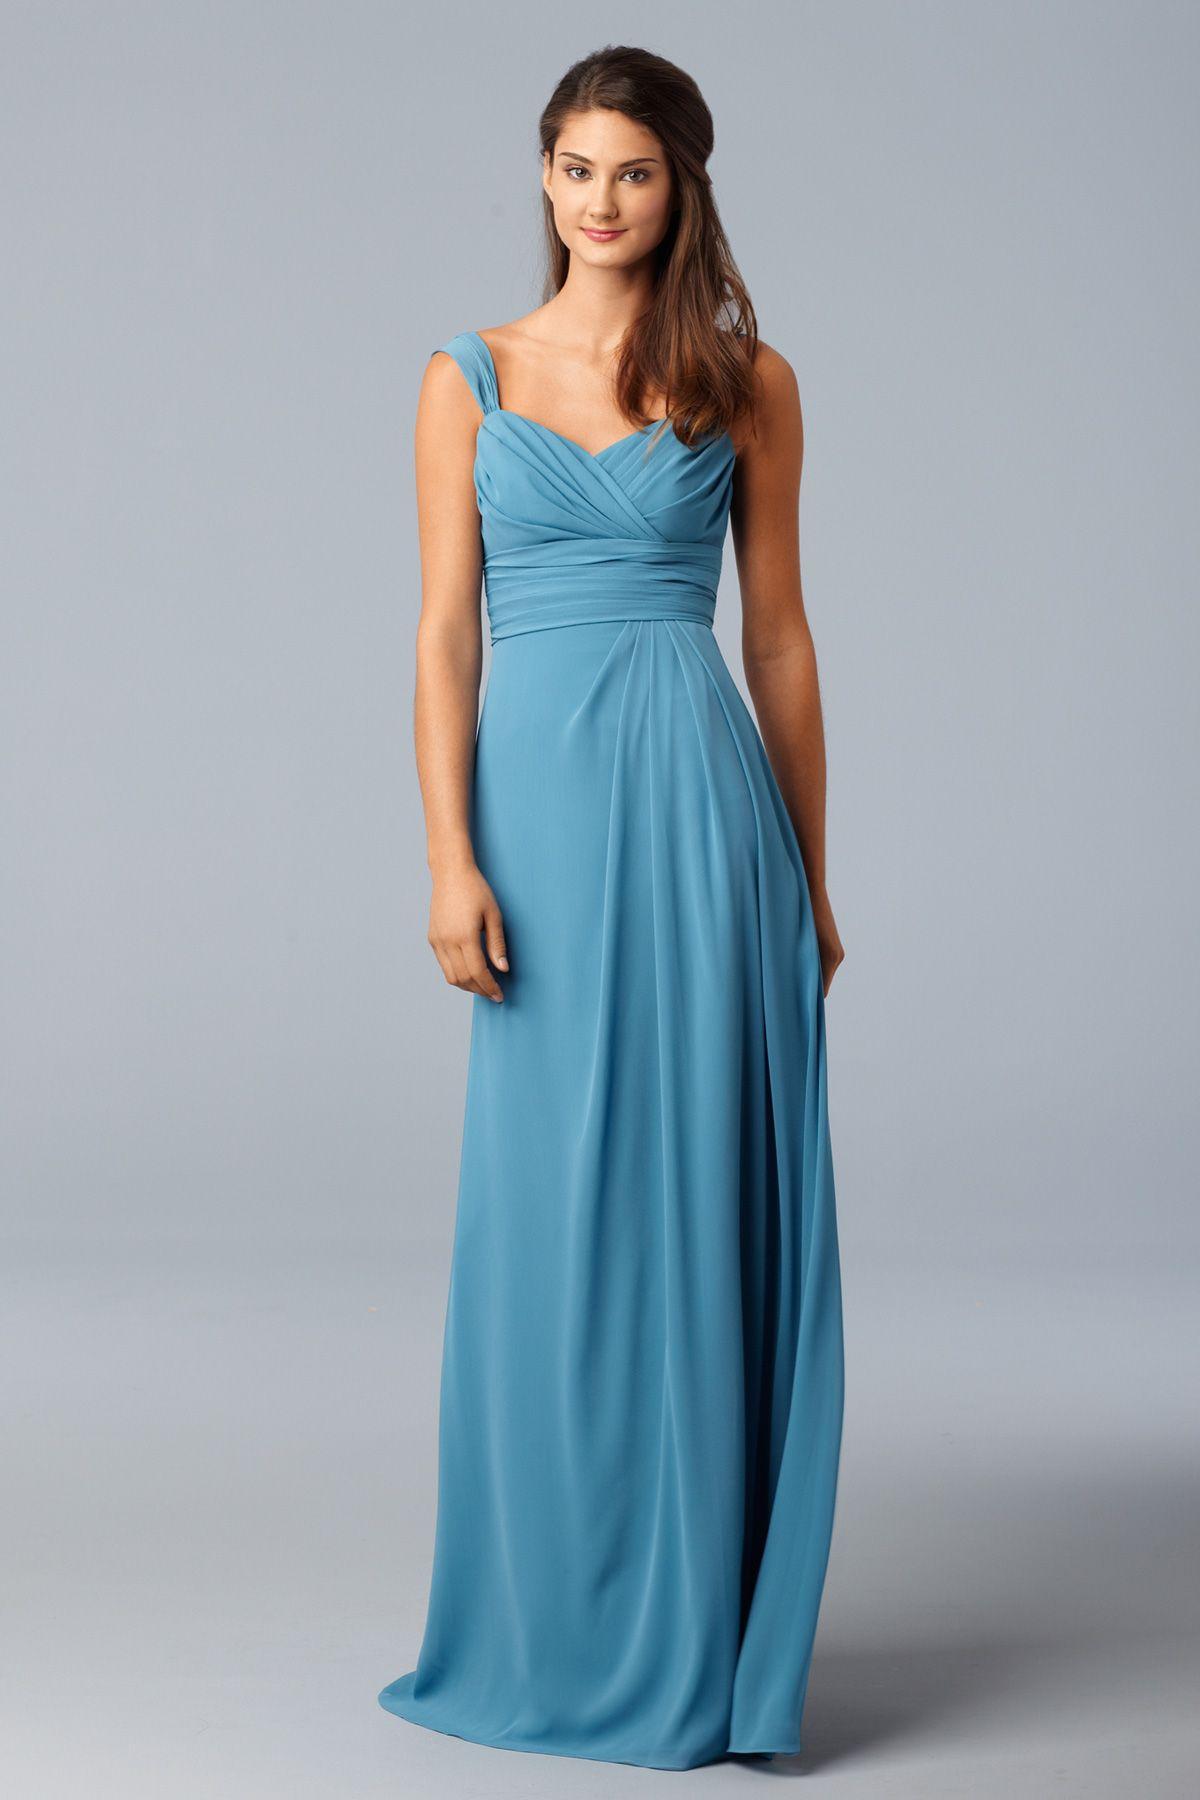 Cheap Tiffany Blue Bridesmaid Dresses | ... Dresses,Cheap Plus size ...